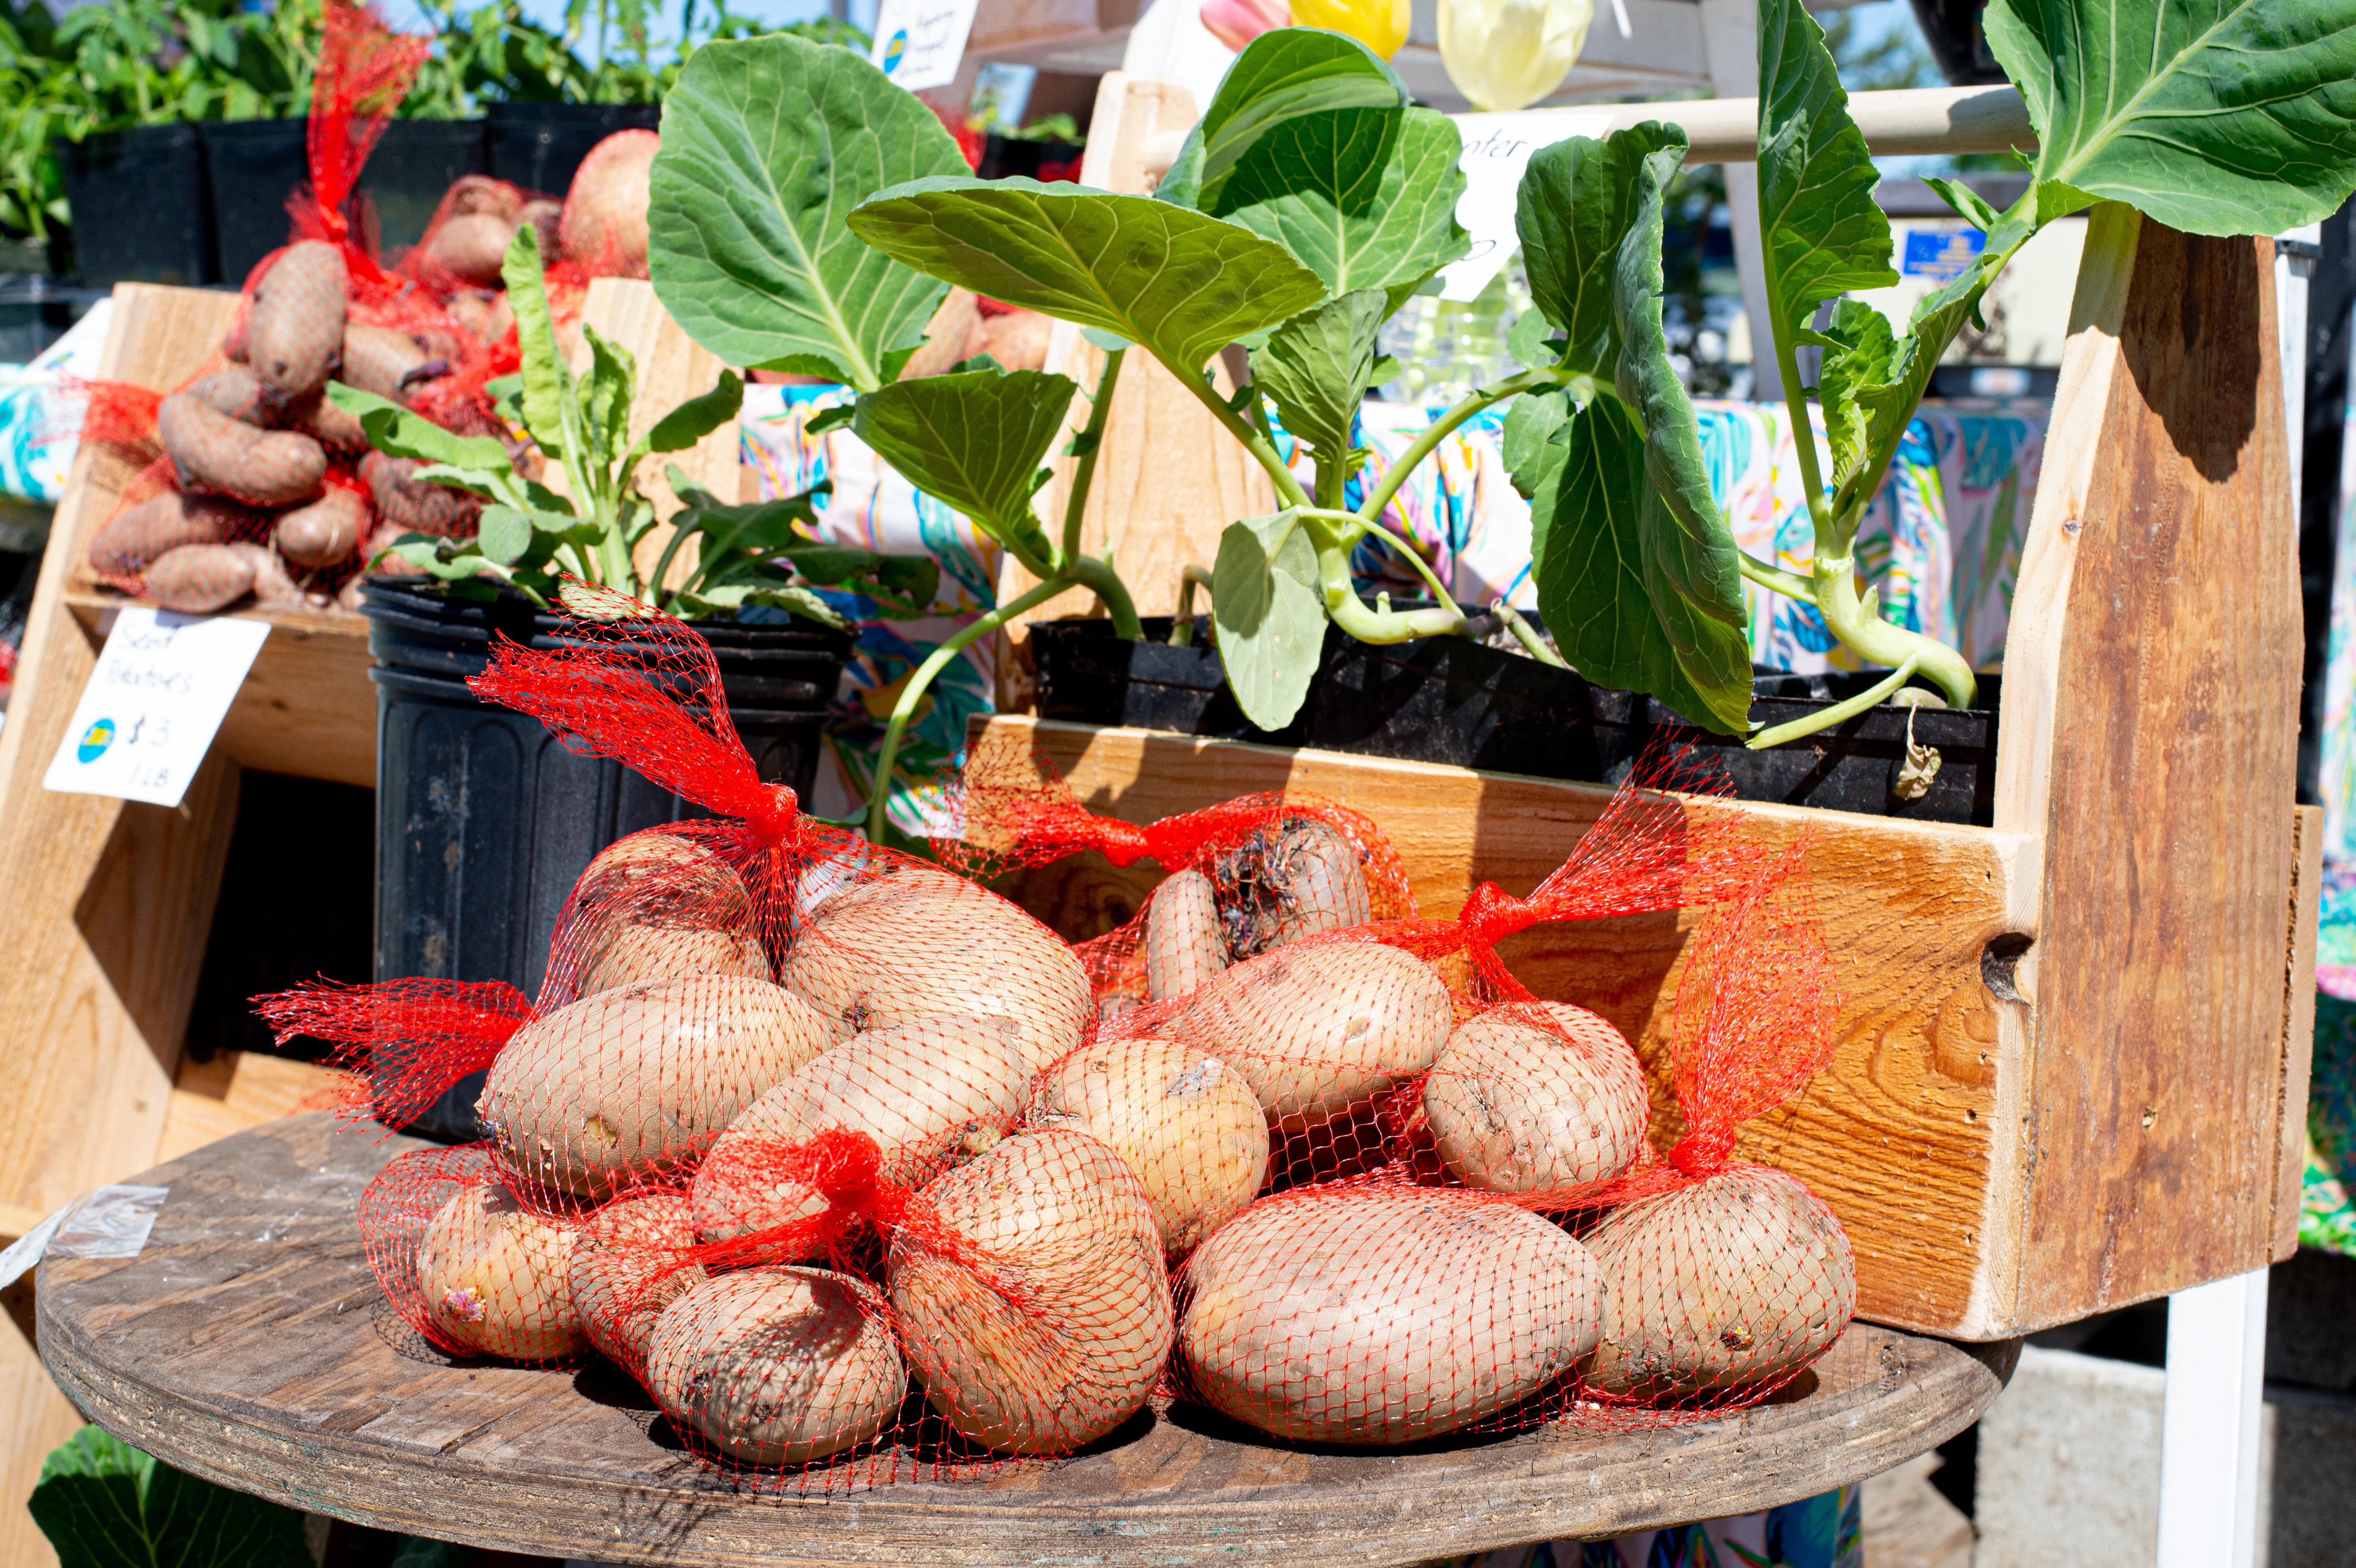 Farmer's Market Tour & Instruction